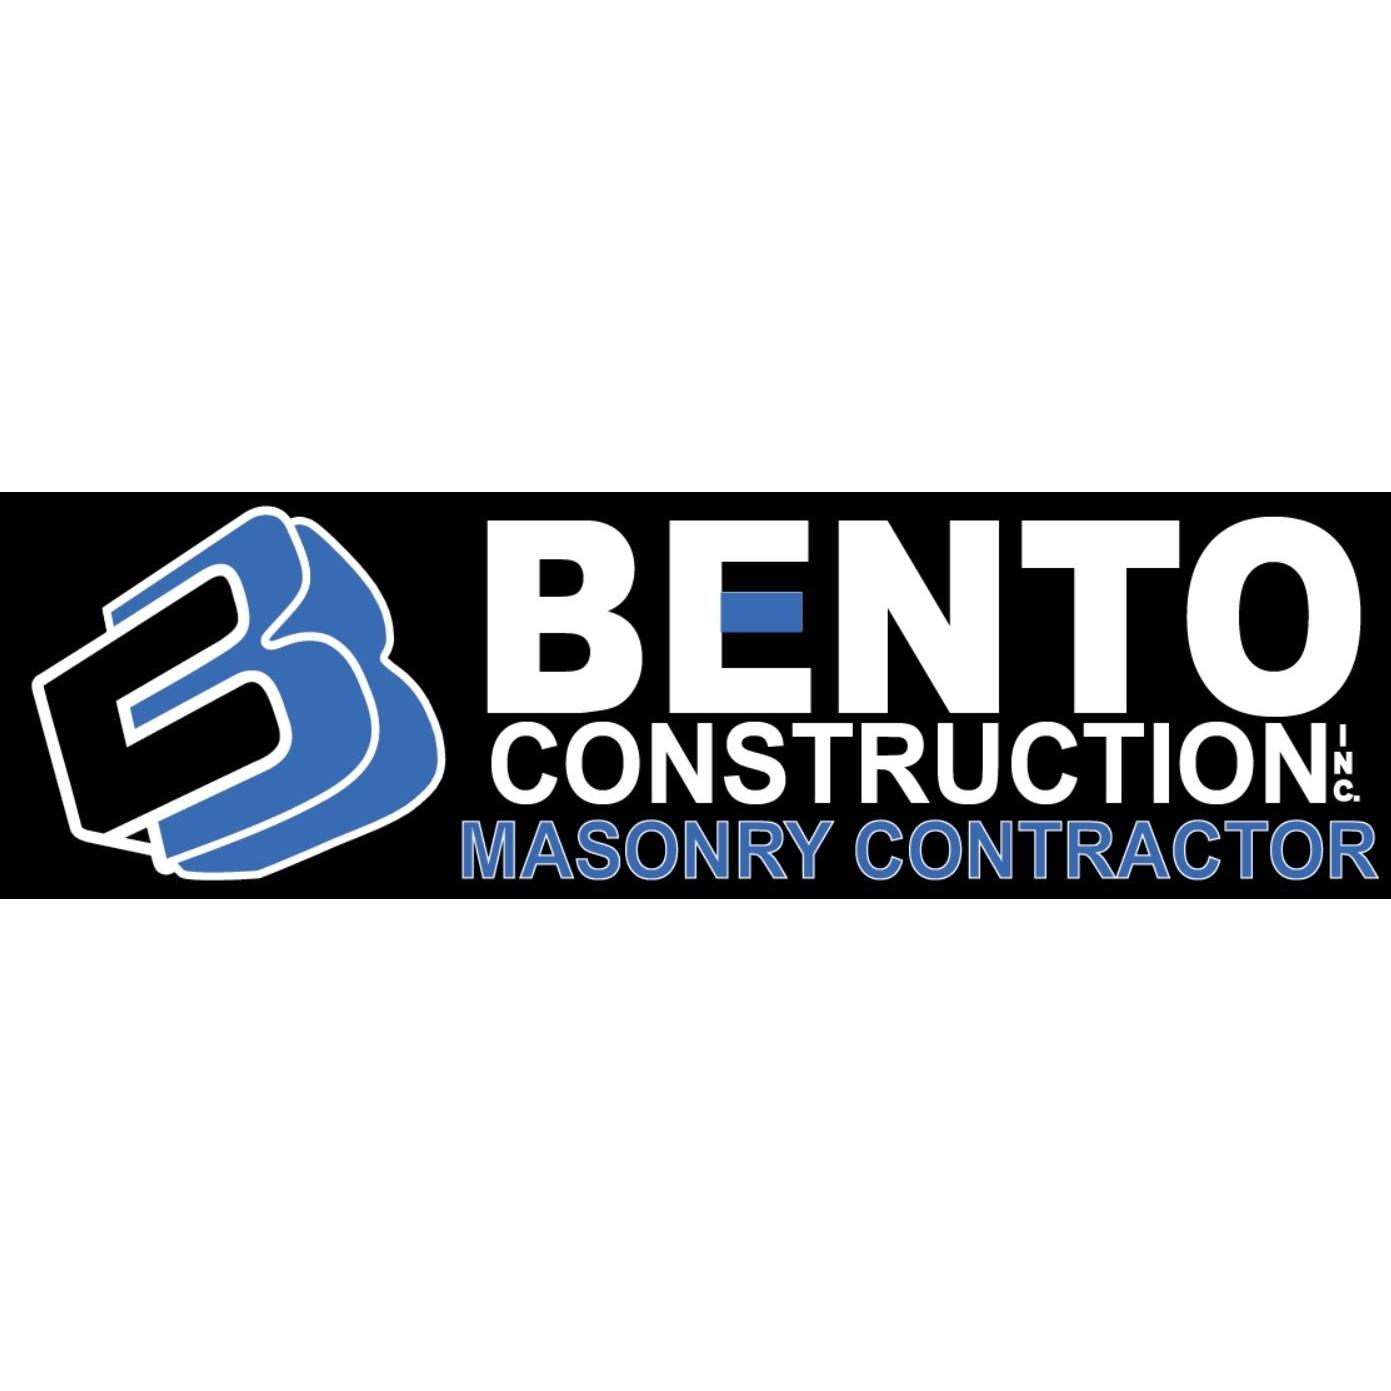 Bento Construction, Inc